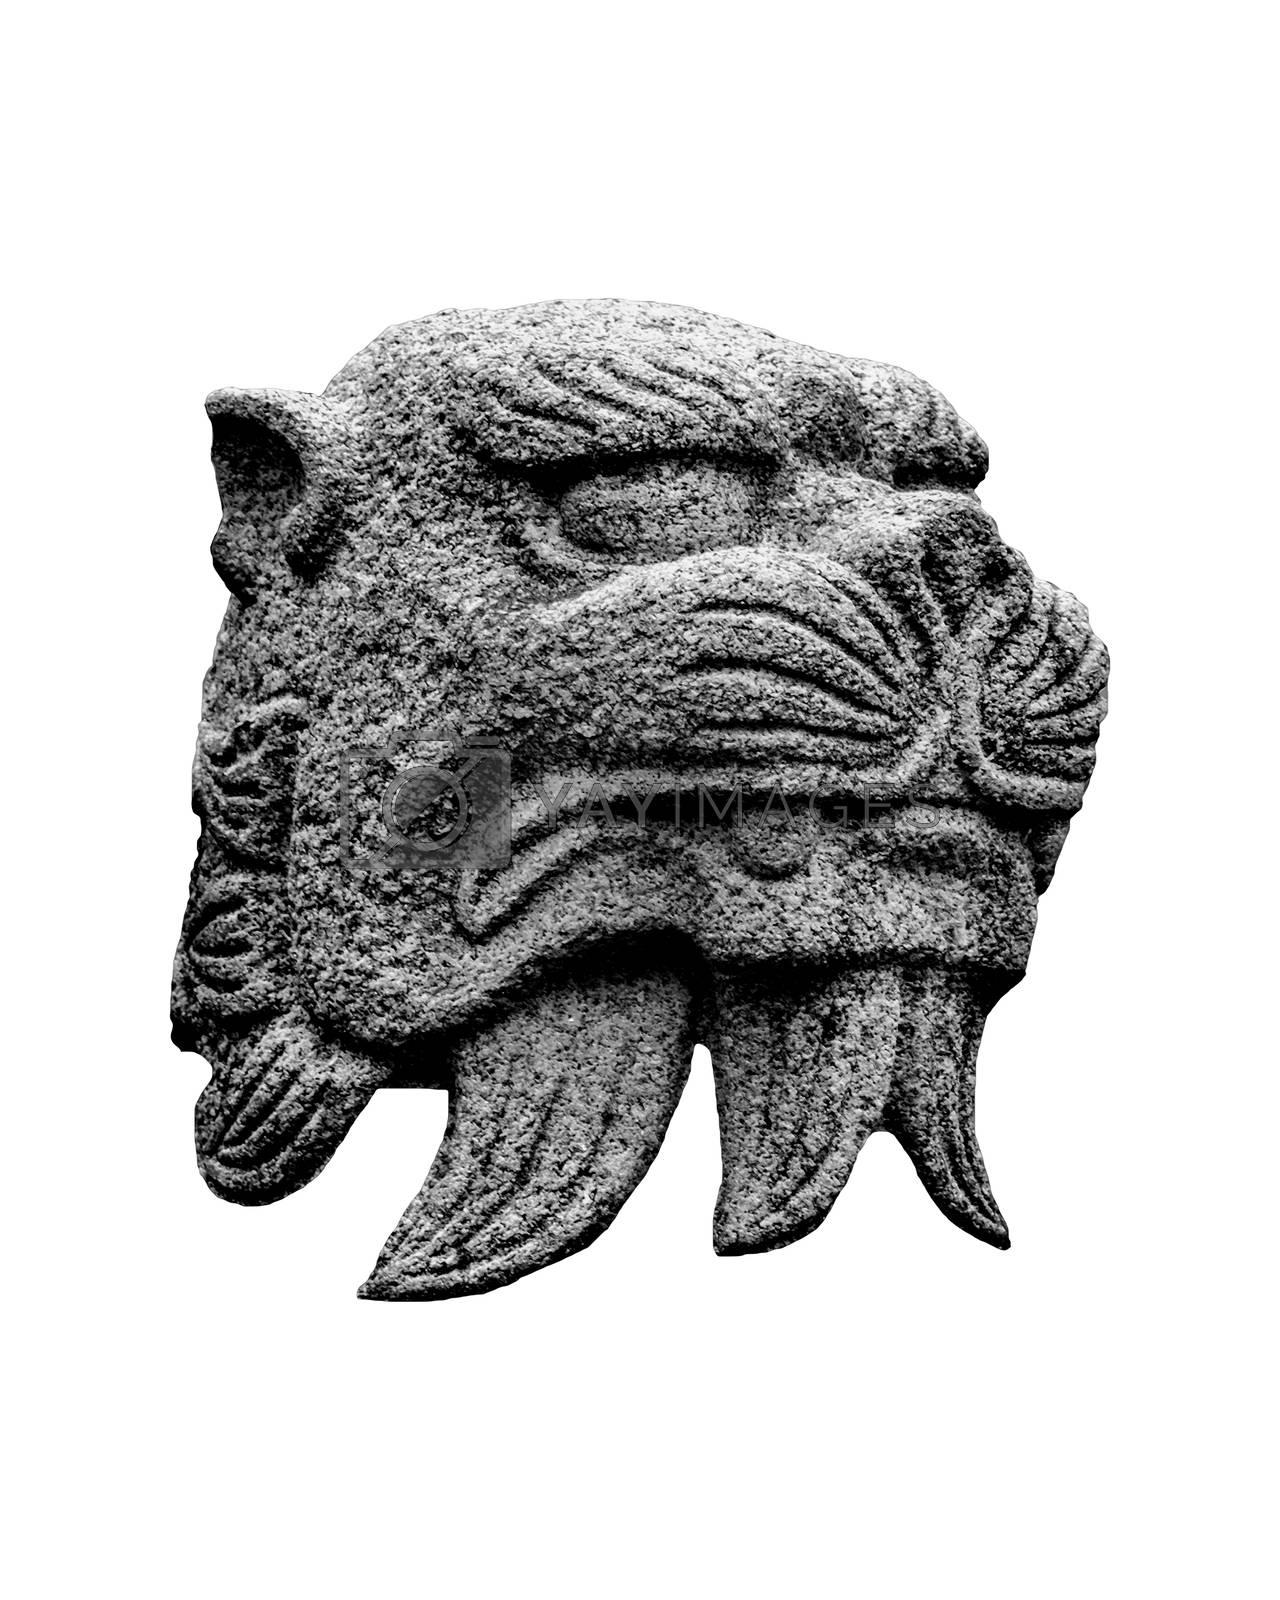 Royalty free image of Japanese Mythological Animal Head Sculpture Isolated Photo by DanFLCreative